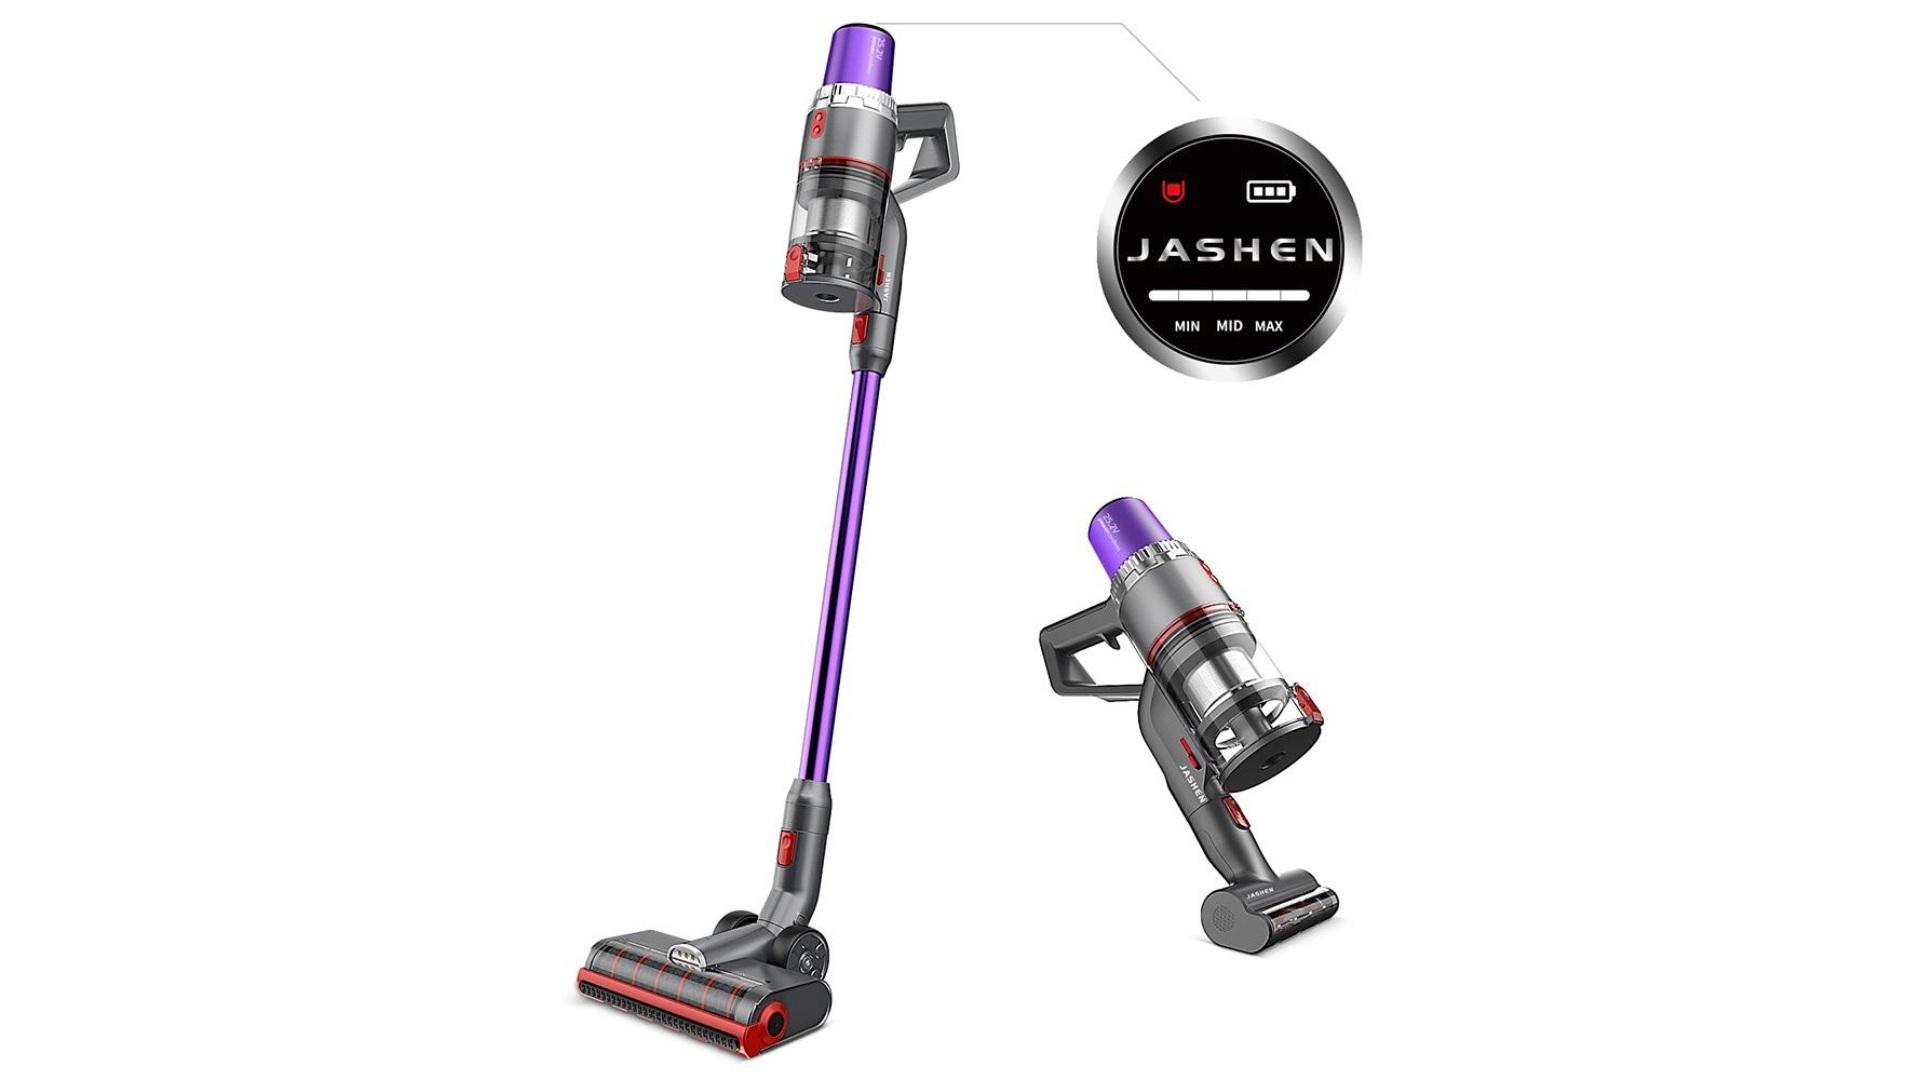 JASHEN V16 aspirapolvere ciclonico – Geekbuying